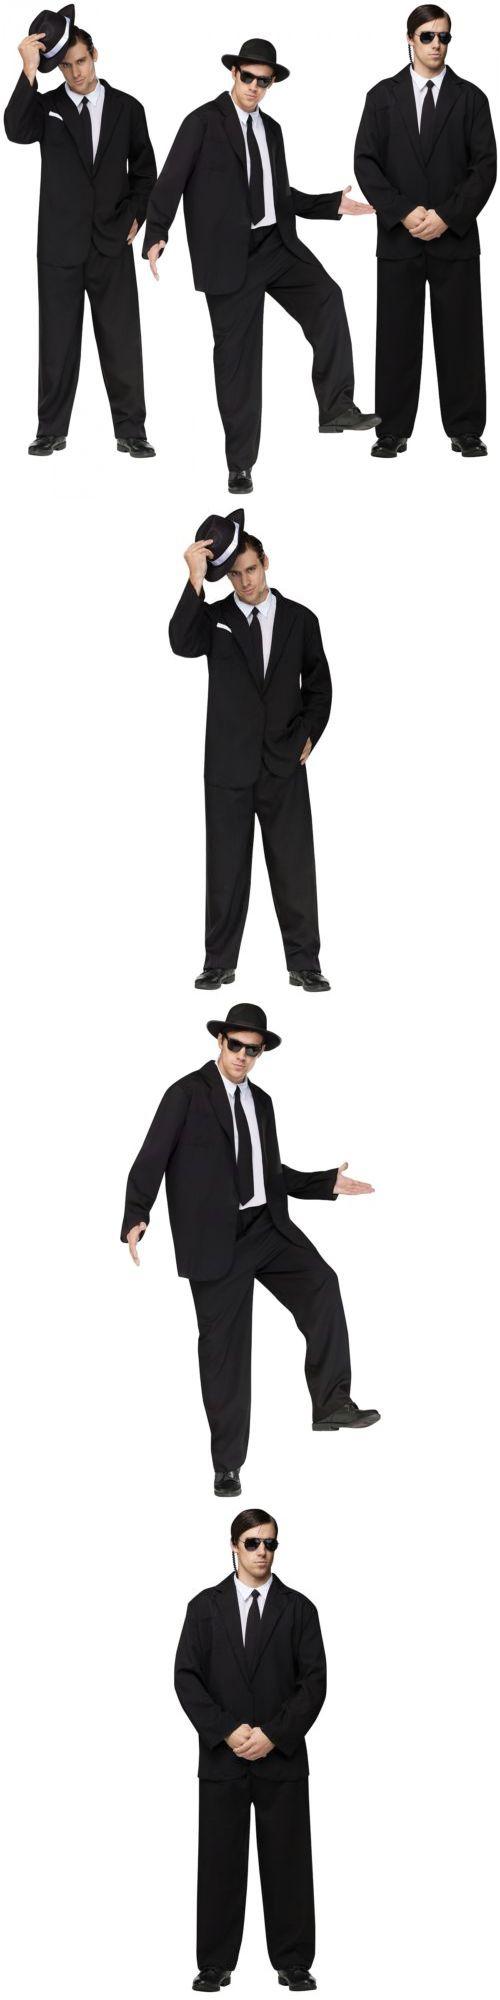 Best 25+ Blues brothers costume ideas on Pinterest | Belushi ...